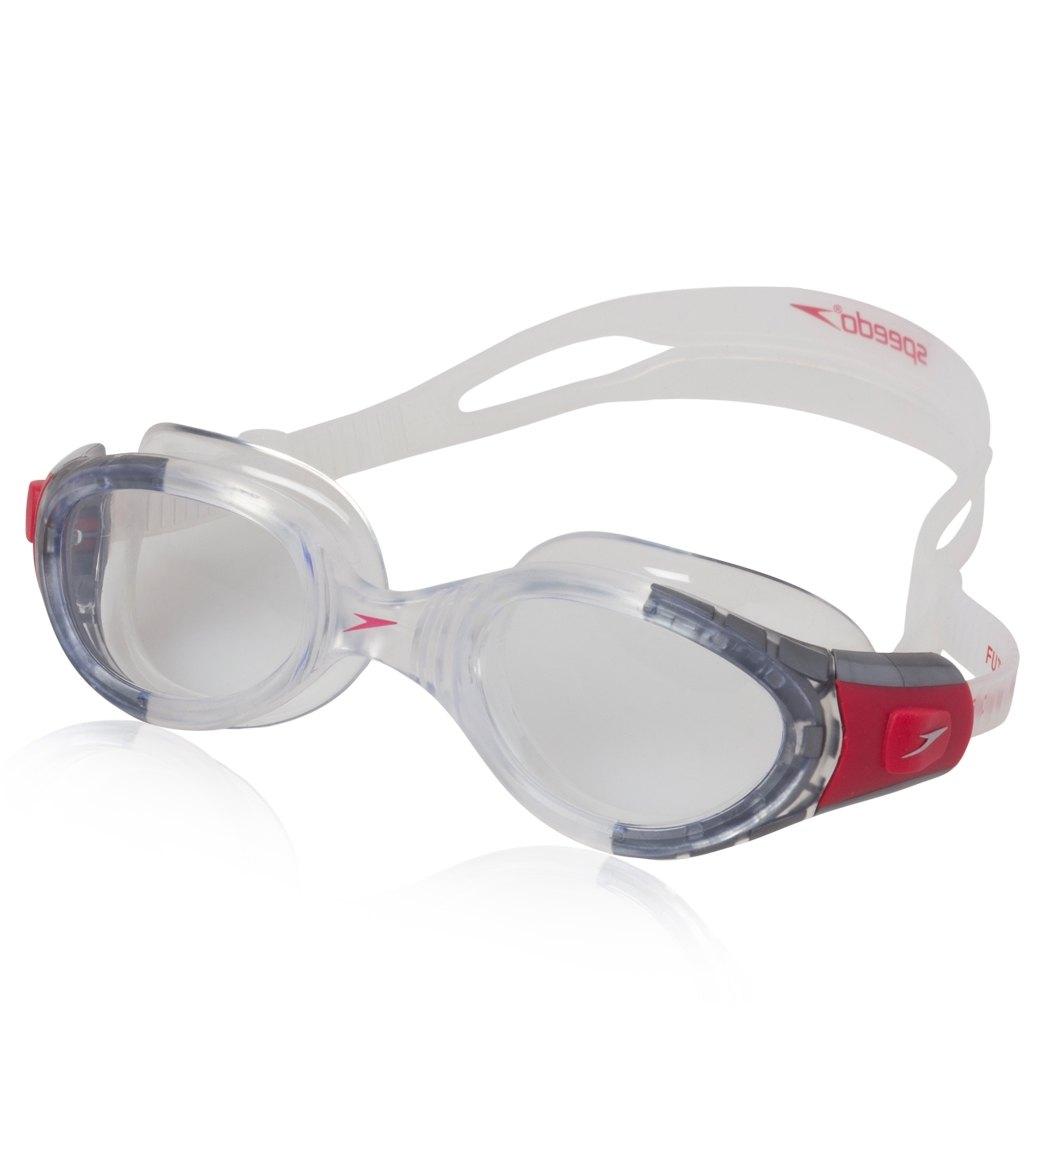 55f717af718f Speedo Futura Biofuse Goggle at SwimOutlet.com